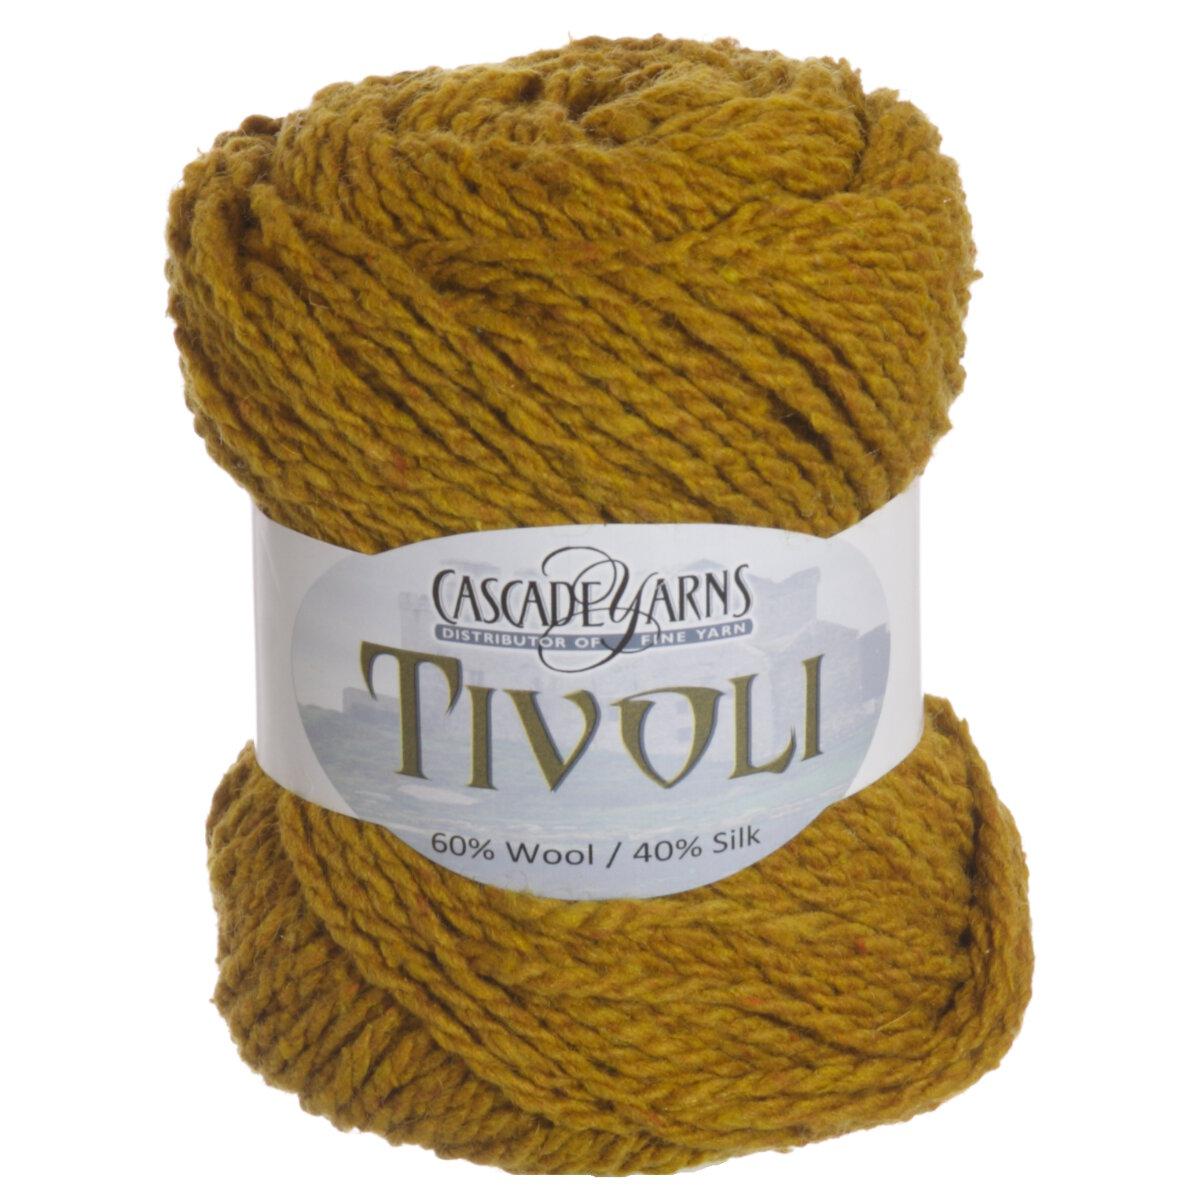 Cascade Tivoli Yarn - 05 Golden at Jimmy Beans Wool